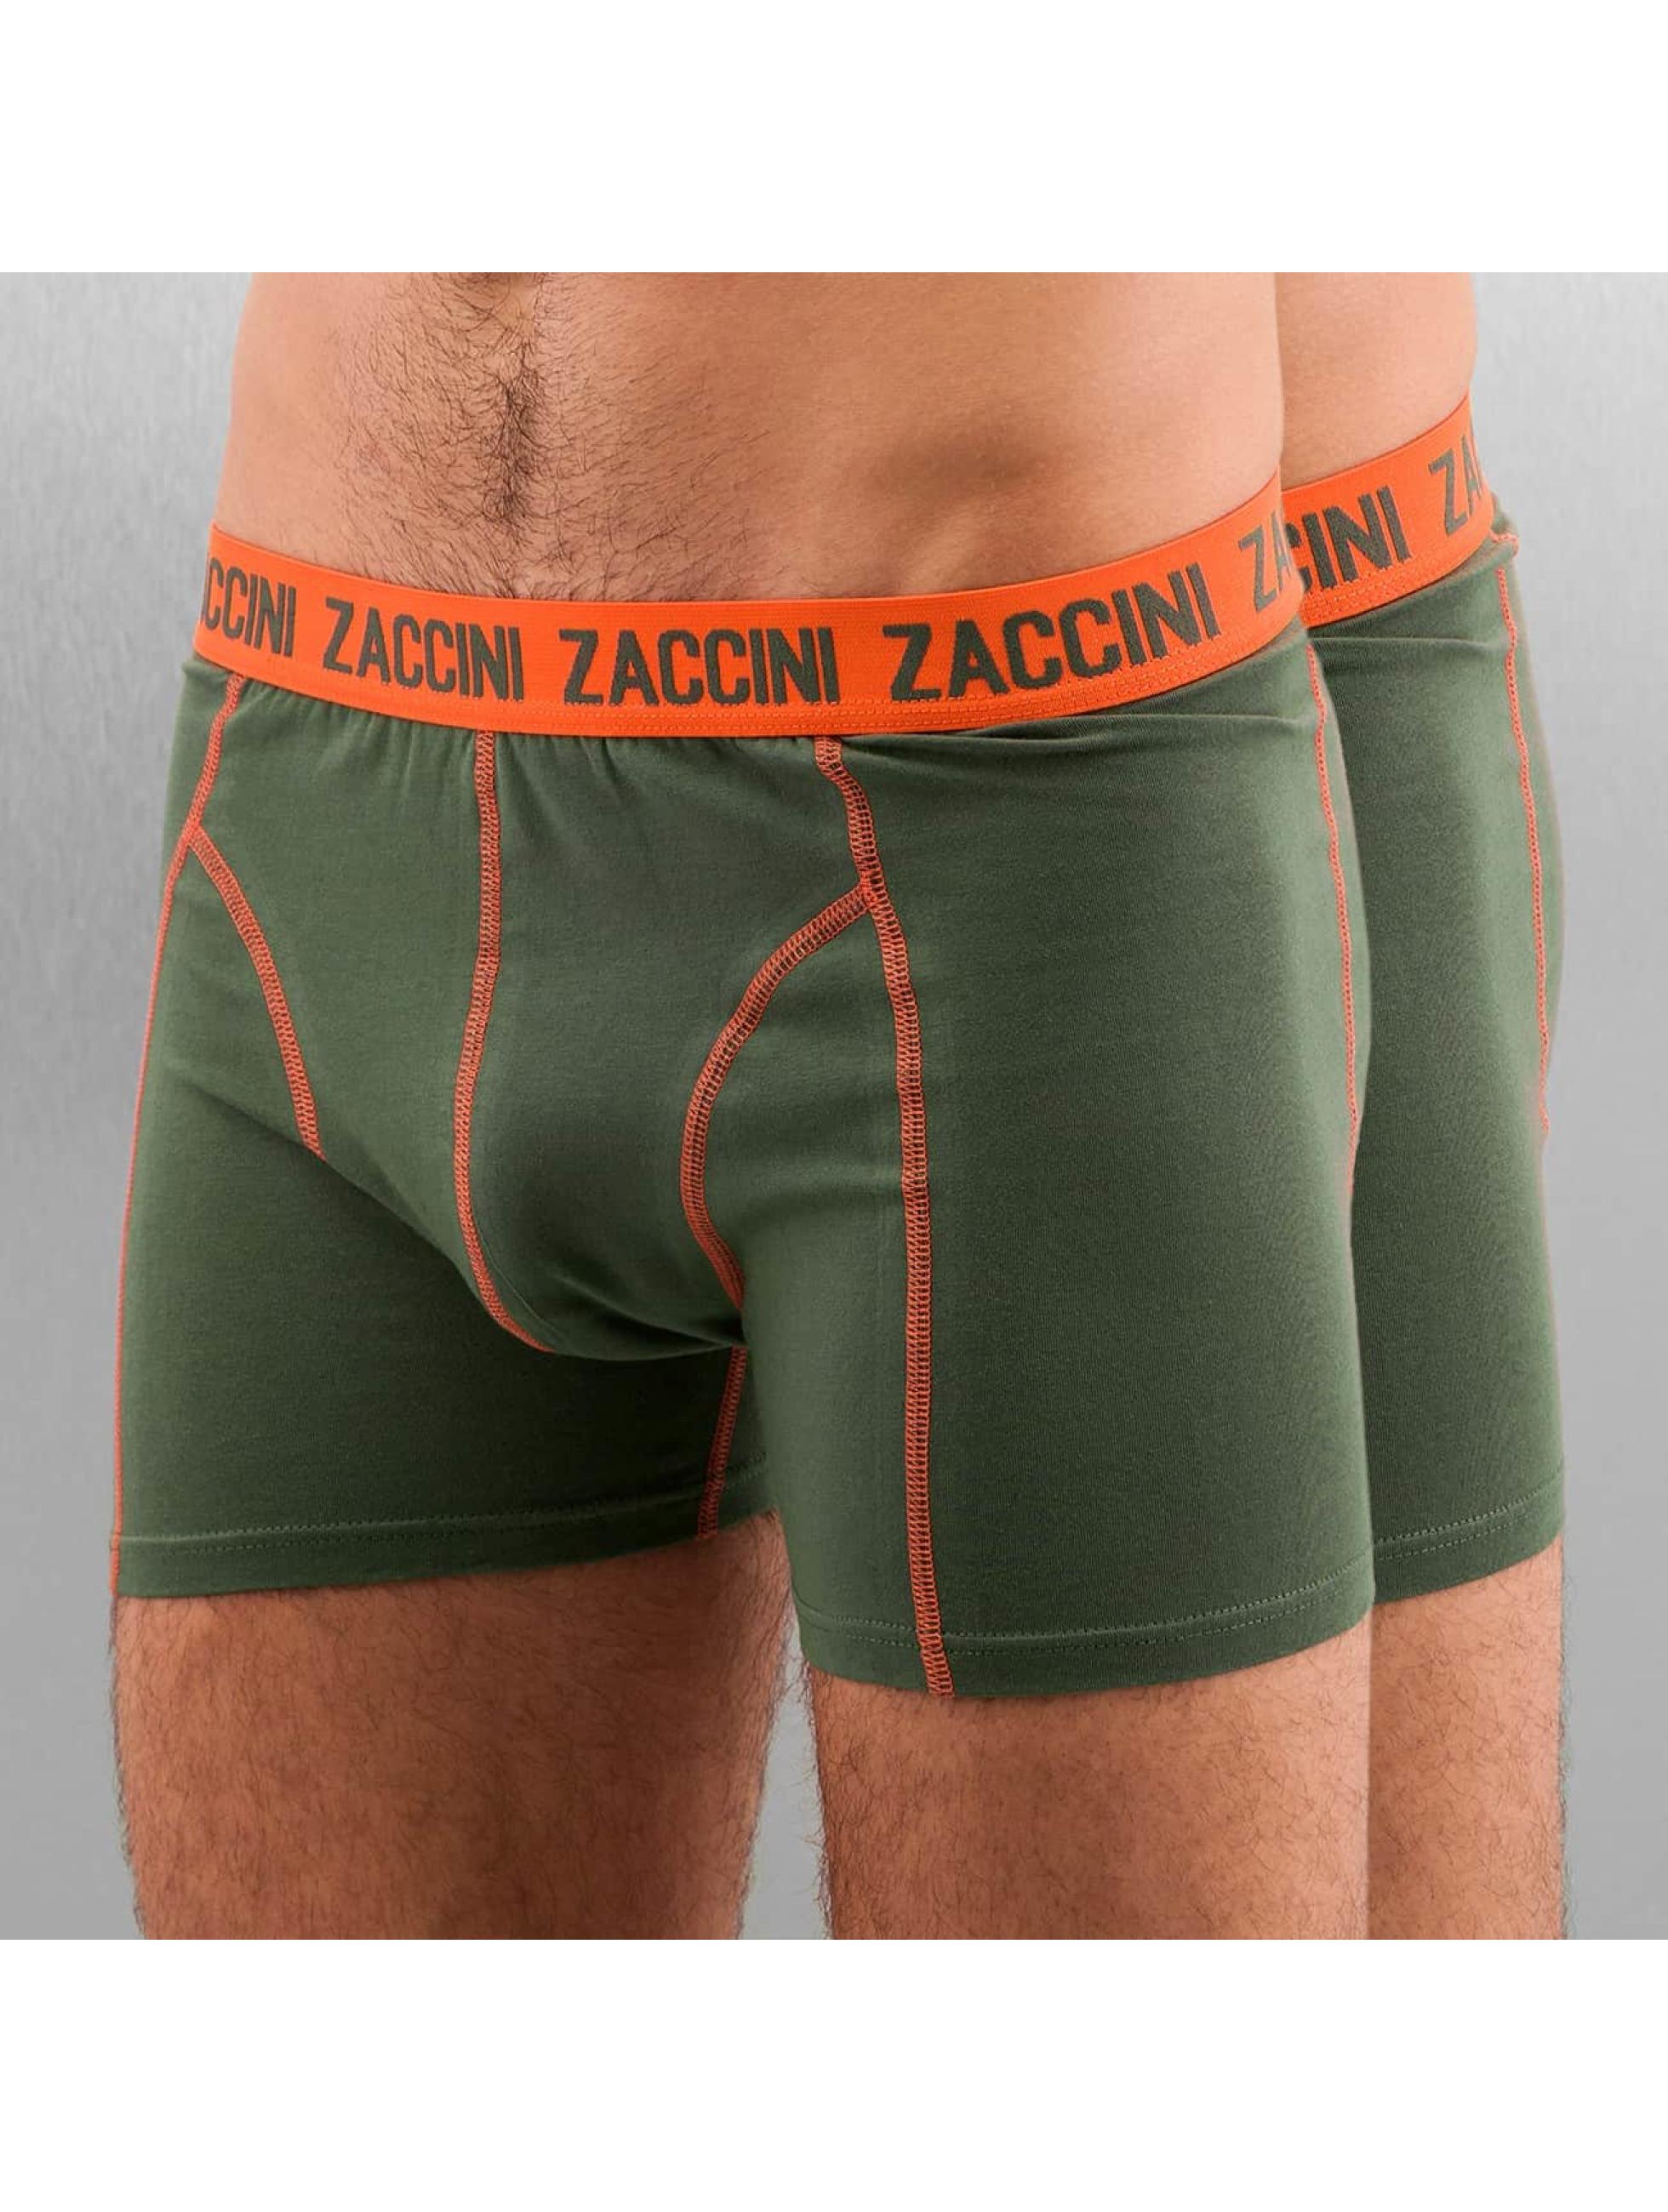 Zaccini Boxershorts Uni 2-Pack olive